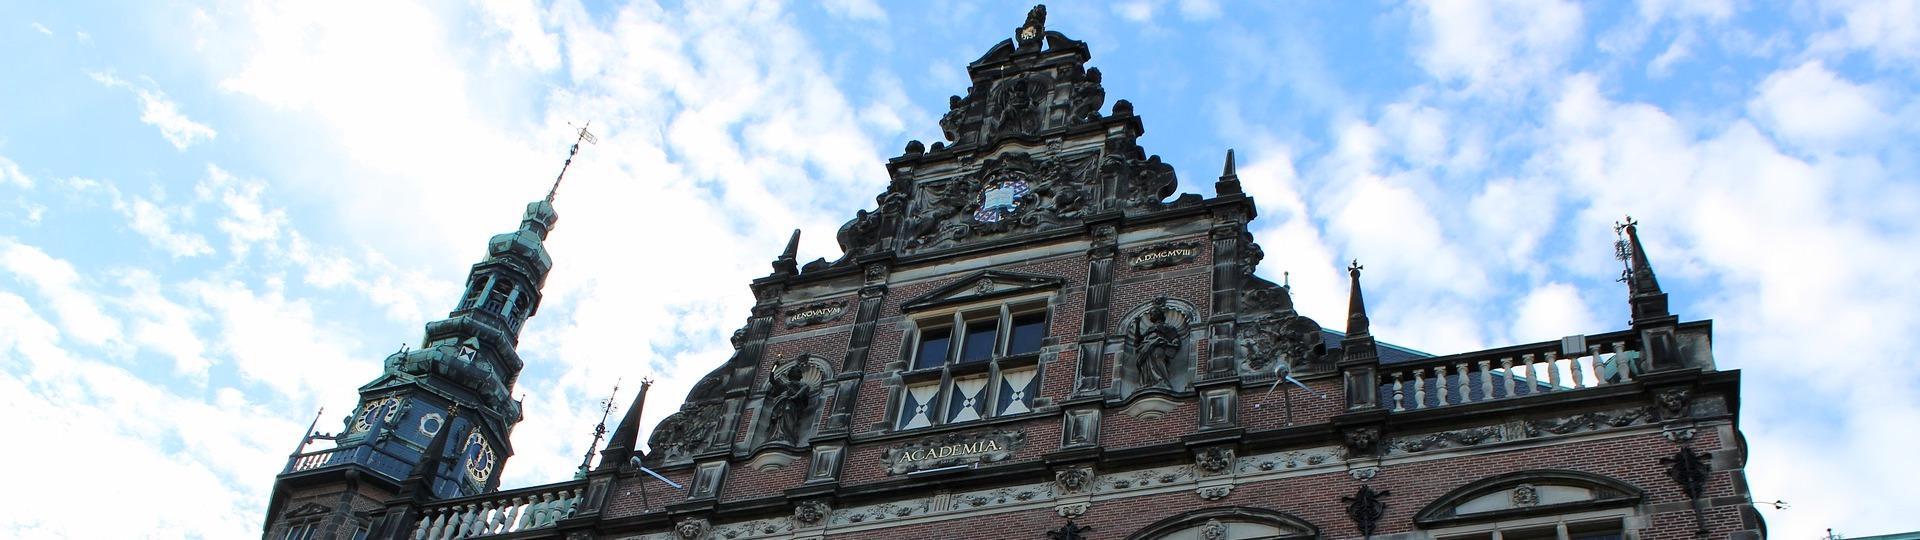 Groningen - RUG